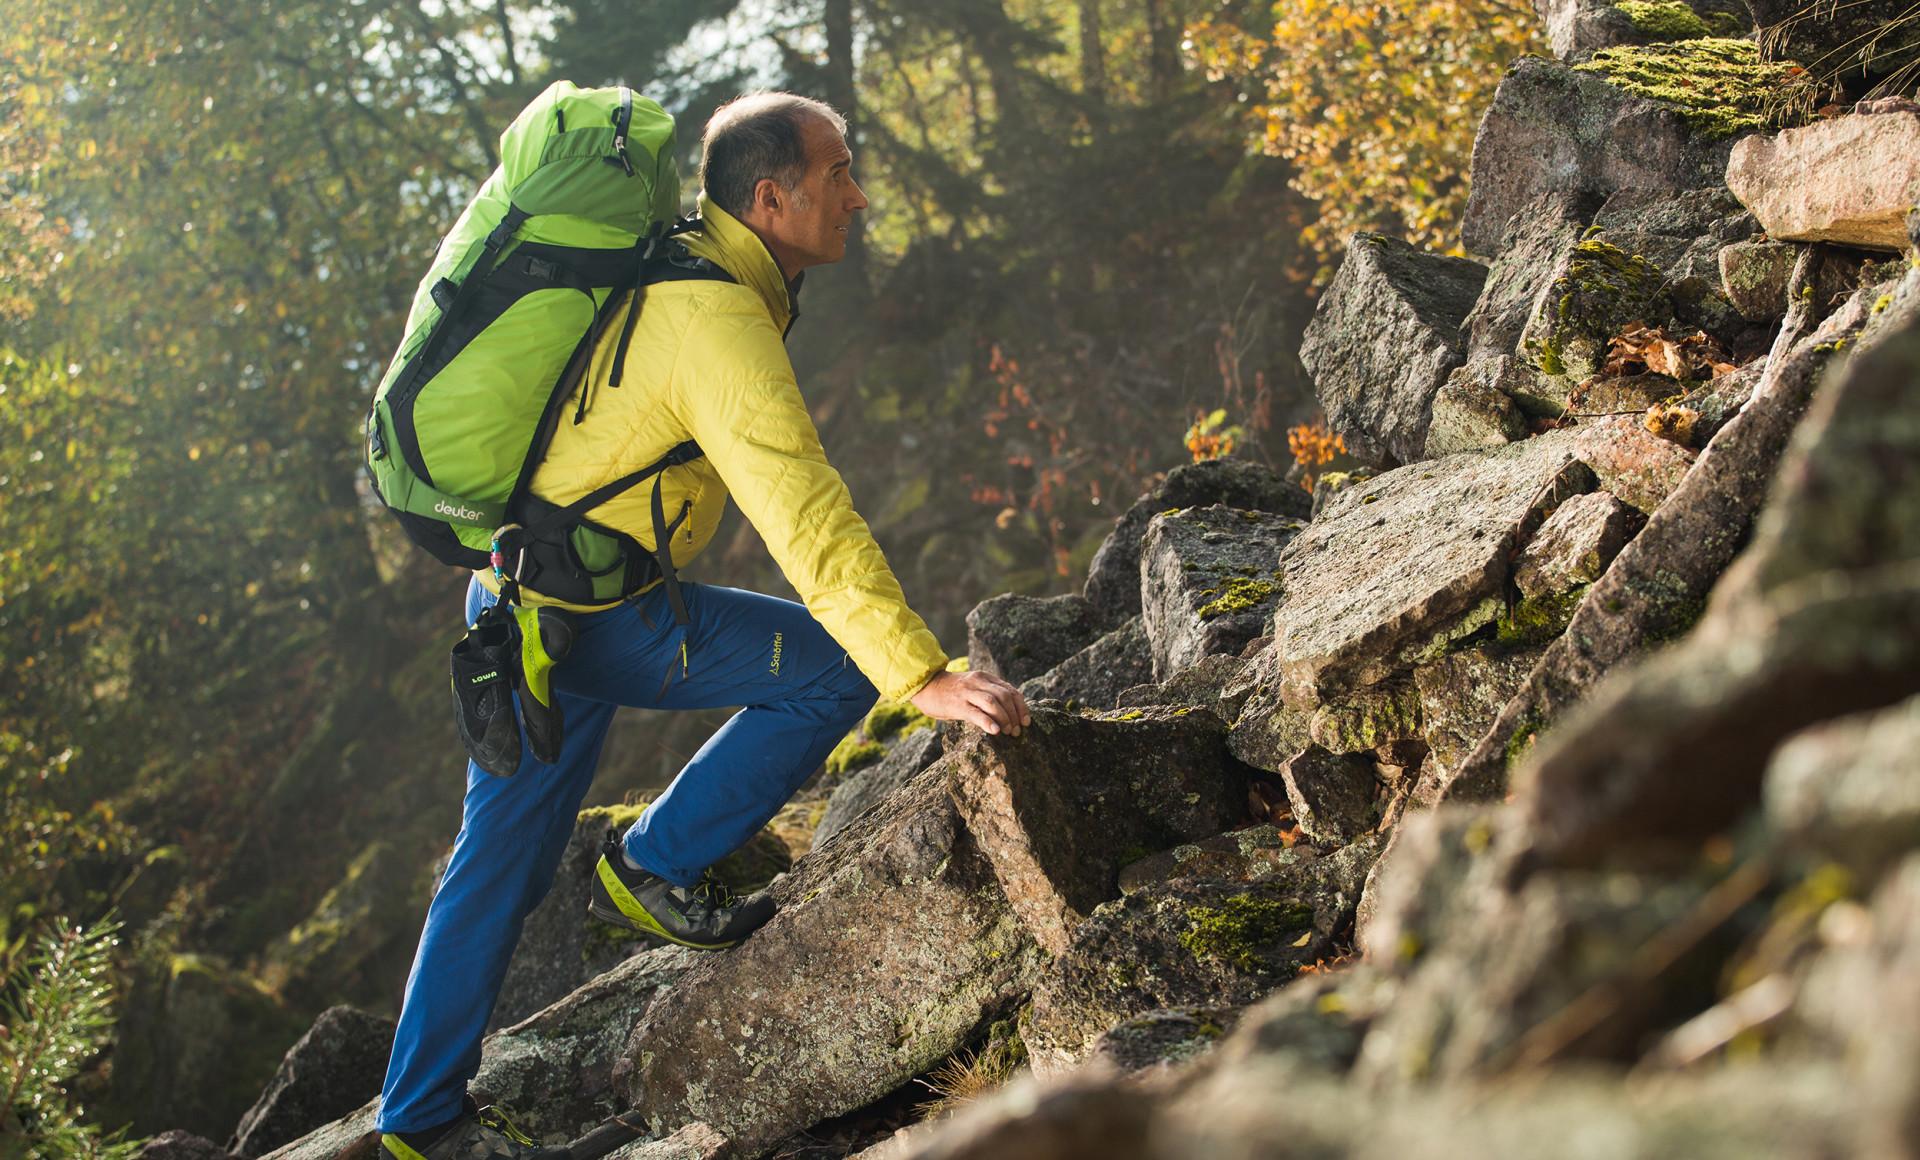 Ralf Dujmovits heads to the summit.